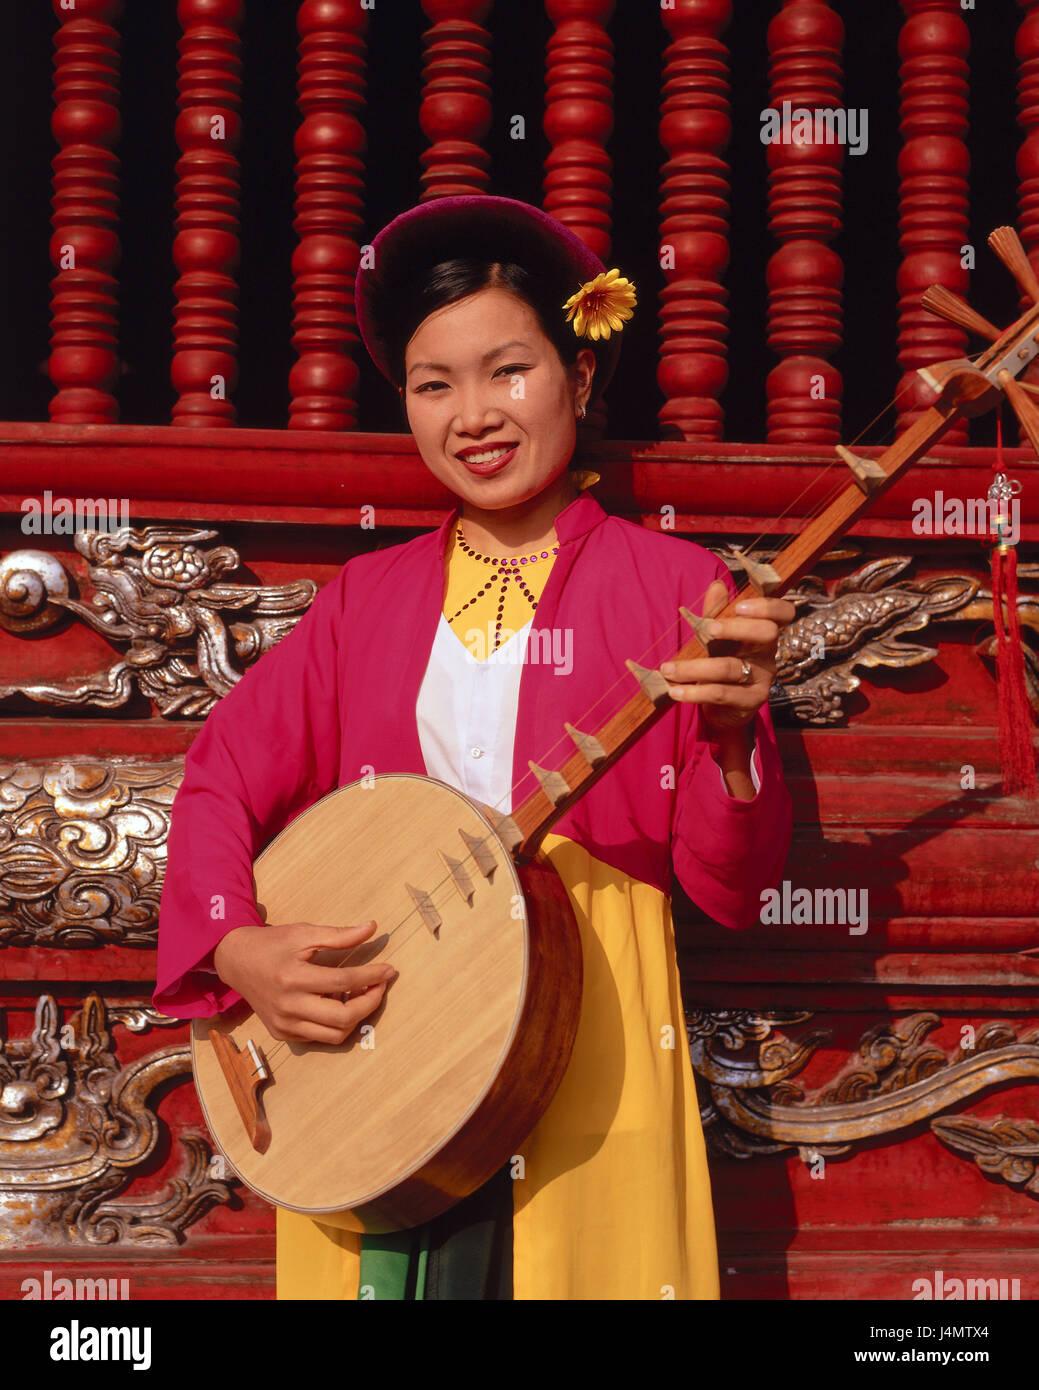 Vietnam, Hanoi, temple of the literature, woman, smile, stringed instrument, Dan Nguyet, half portrait Asia, South - Stock Image